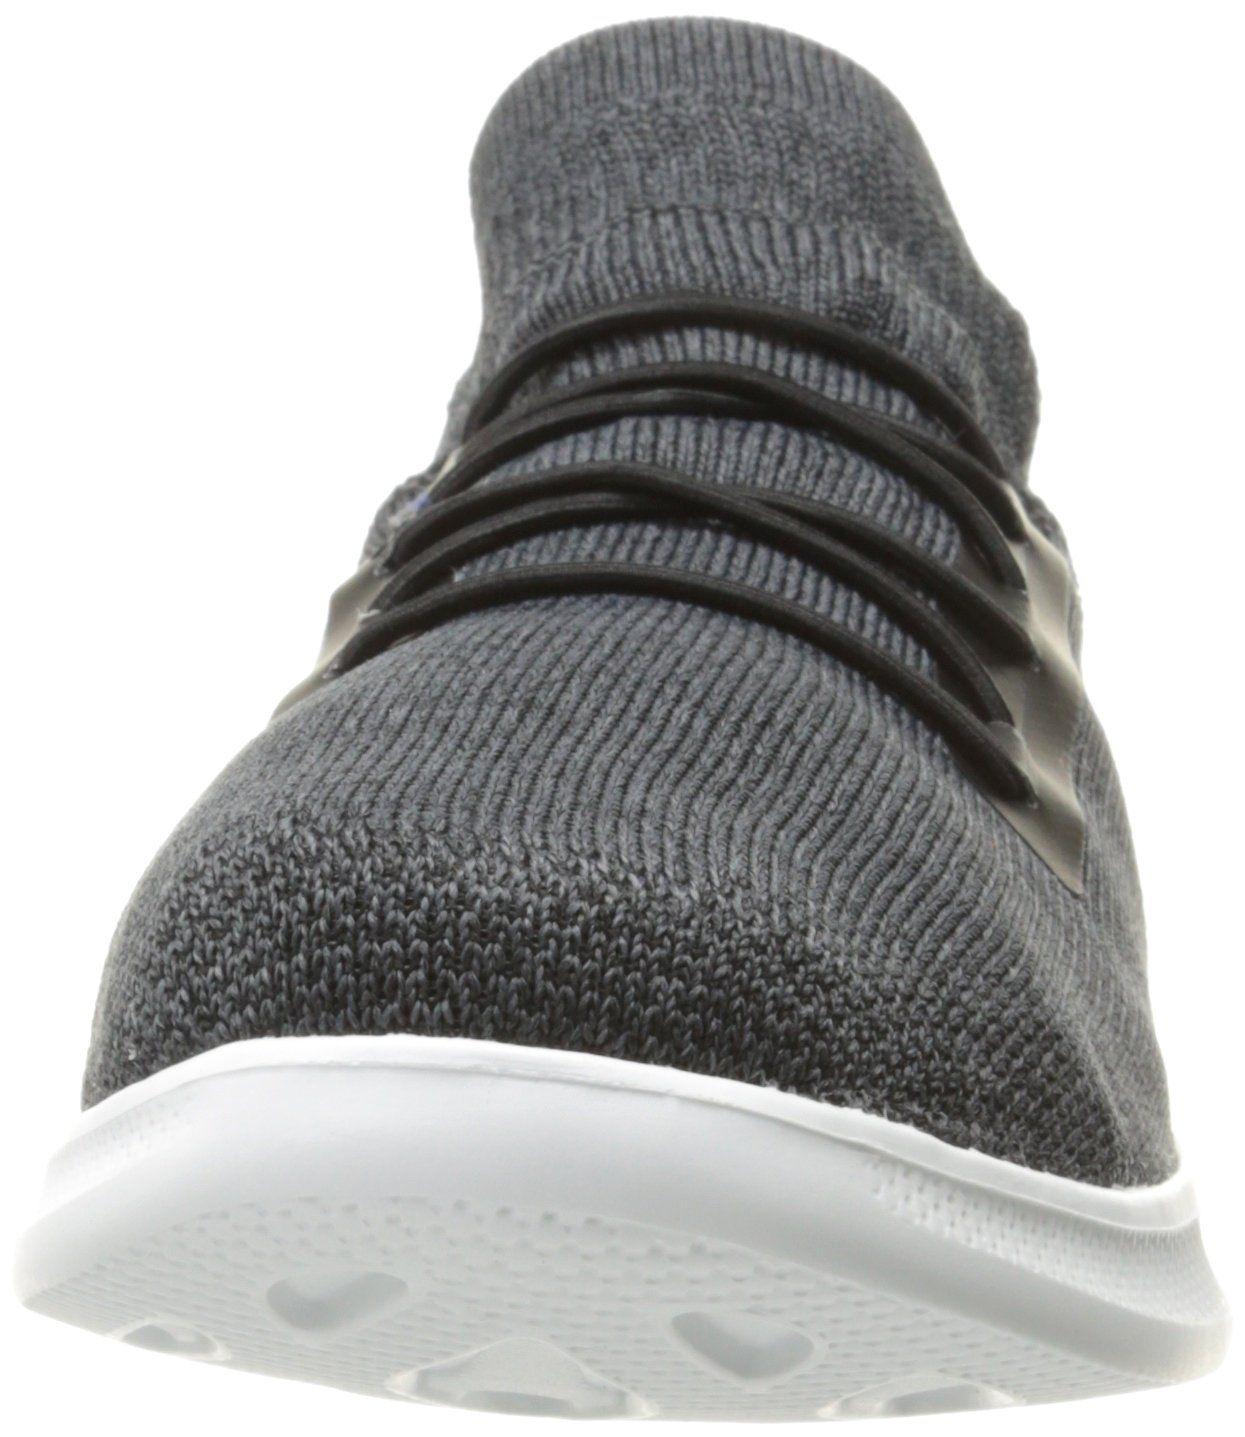 Skechers performance, Walking shoes